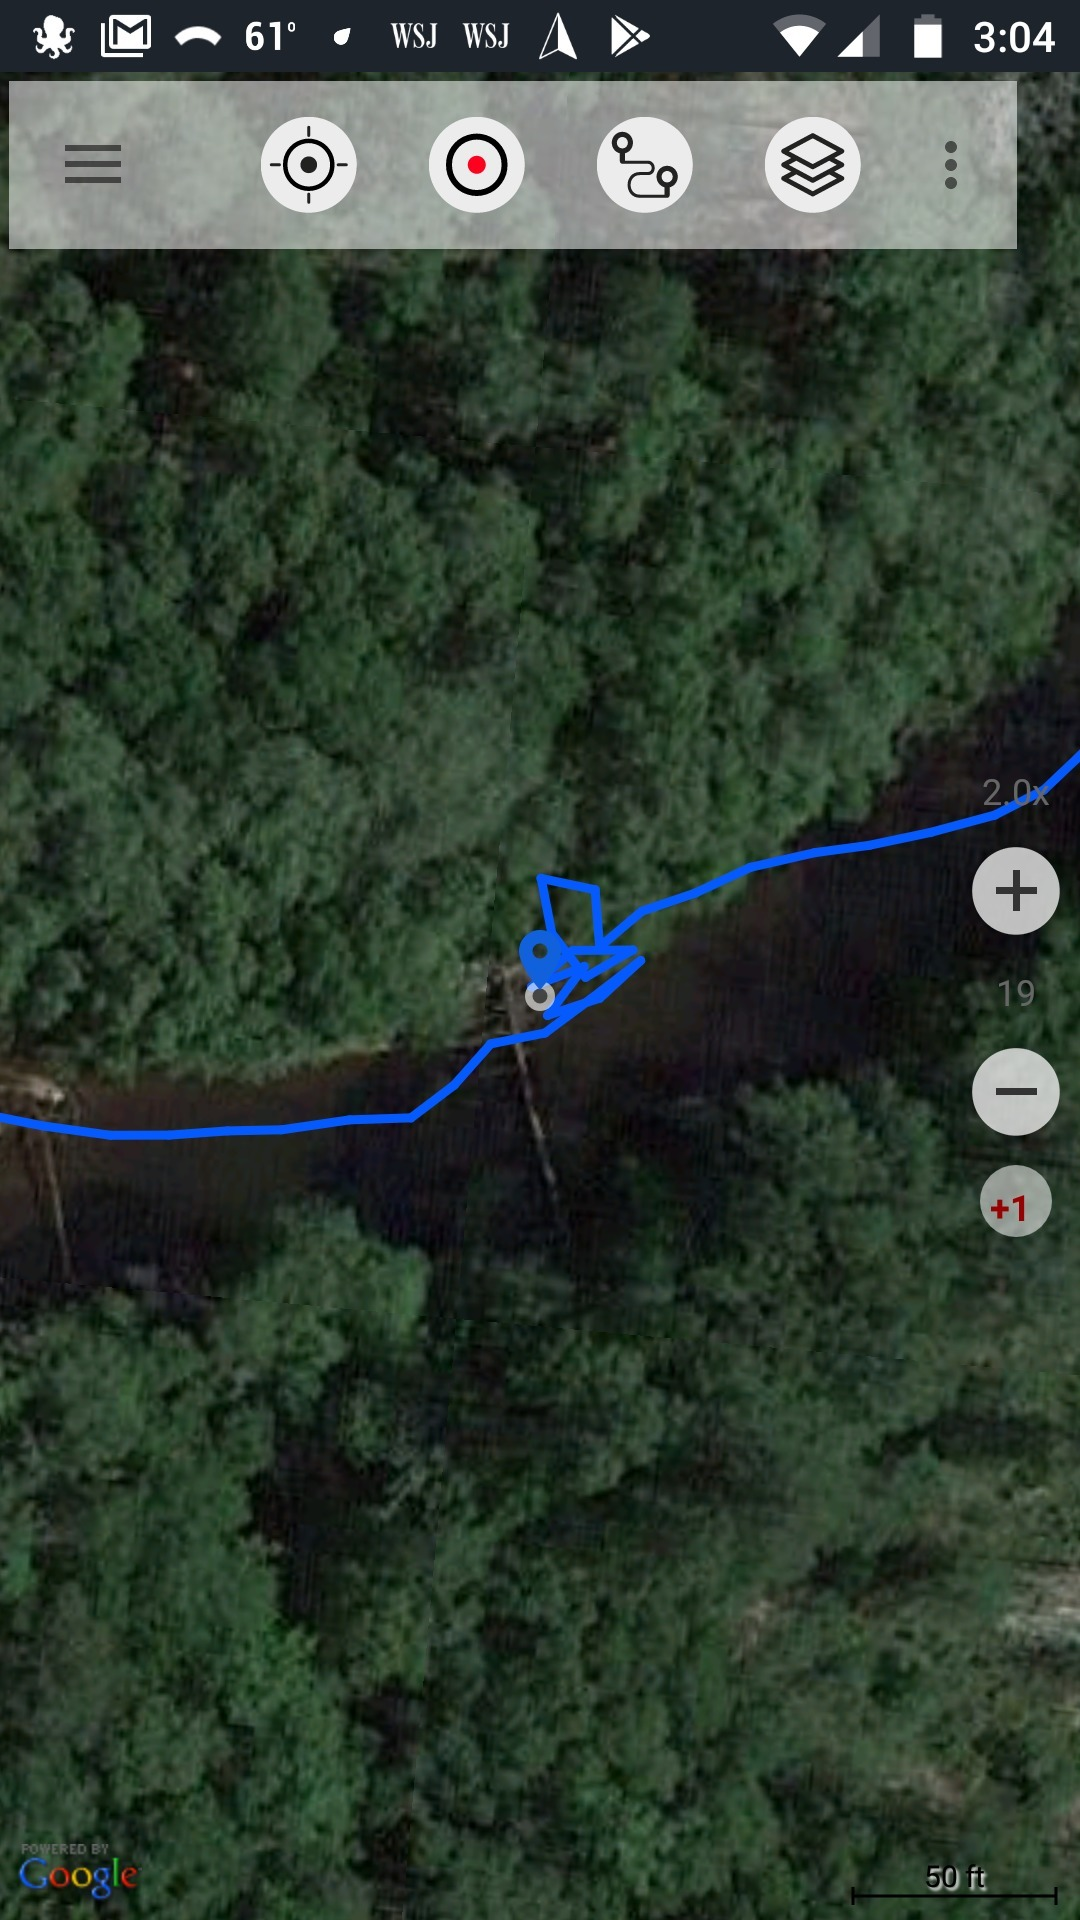 1080x1920 Deadfall Found, Maps, in Deadfall, Alapaha River, between Berrien Beach and Lakeland, by John S. Quarterman, for WWALS.net, 15 April 2018